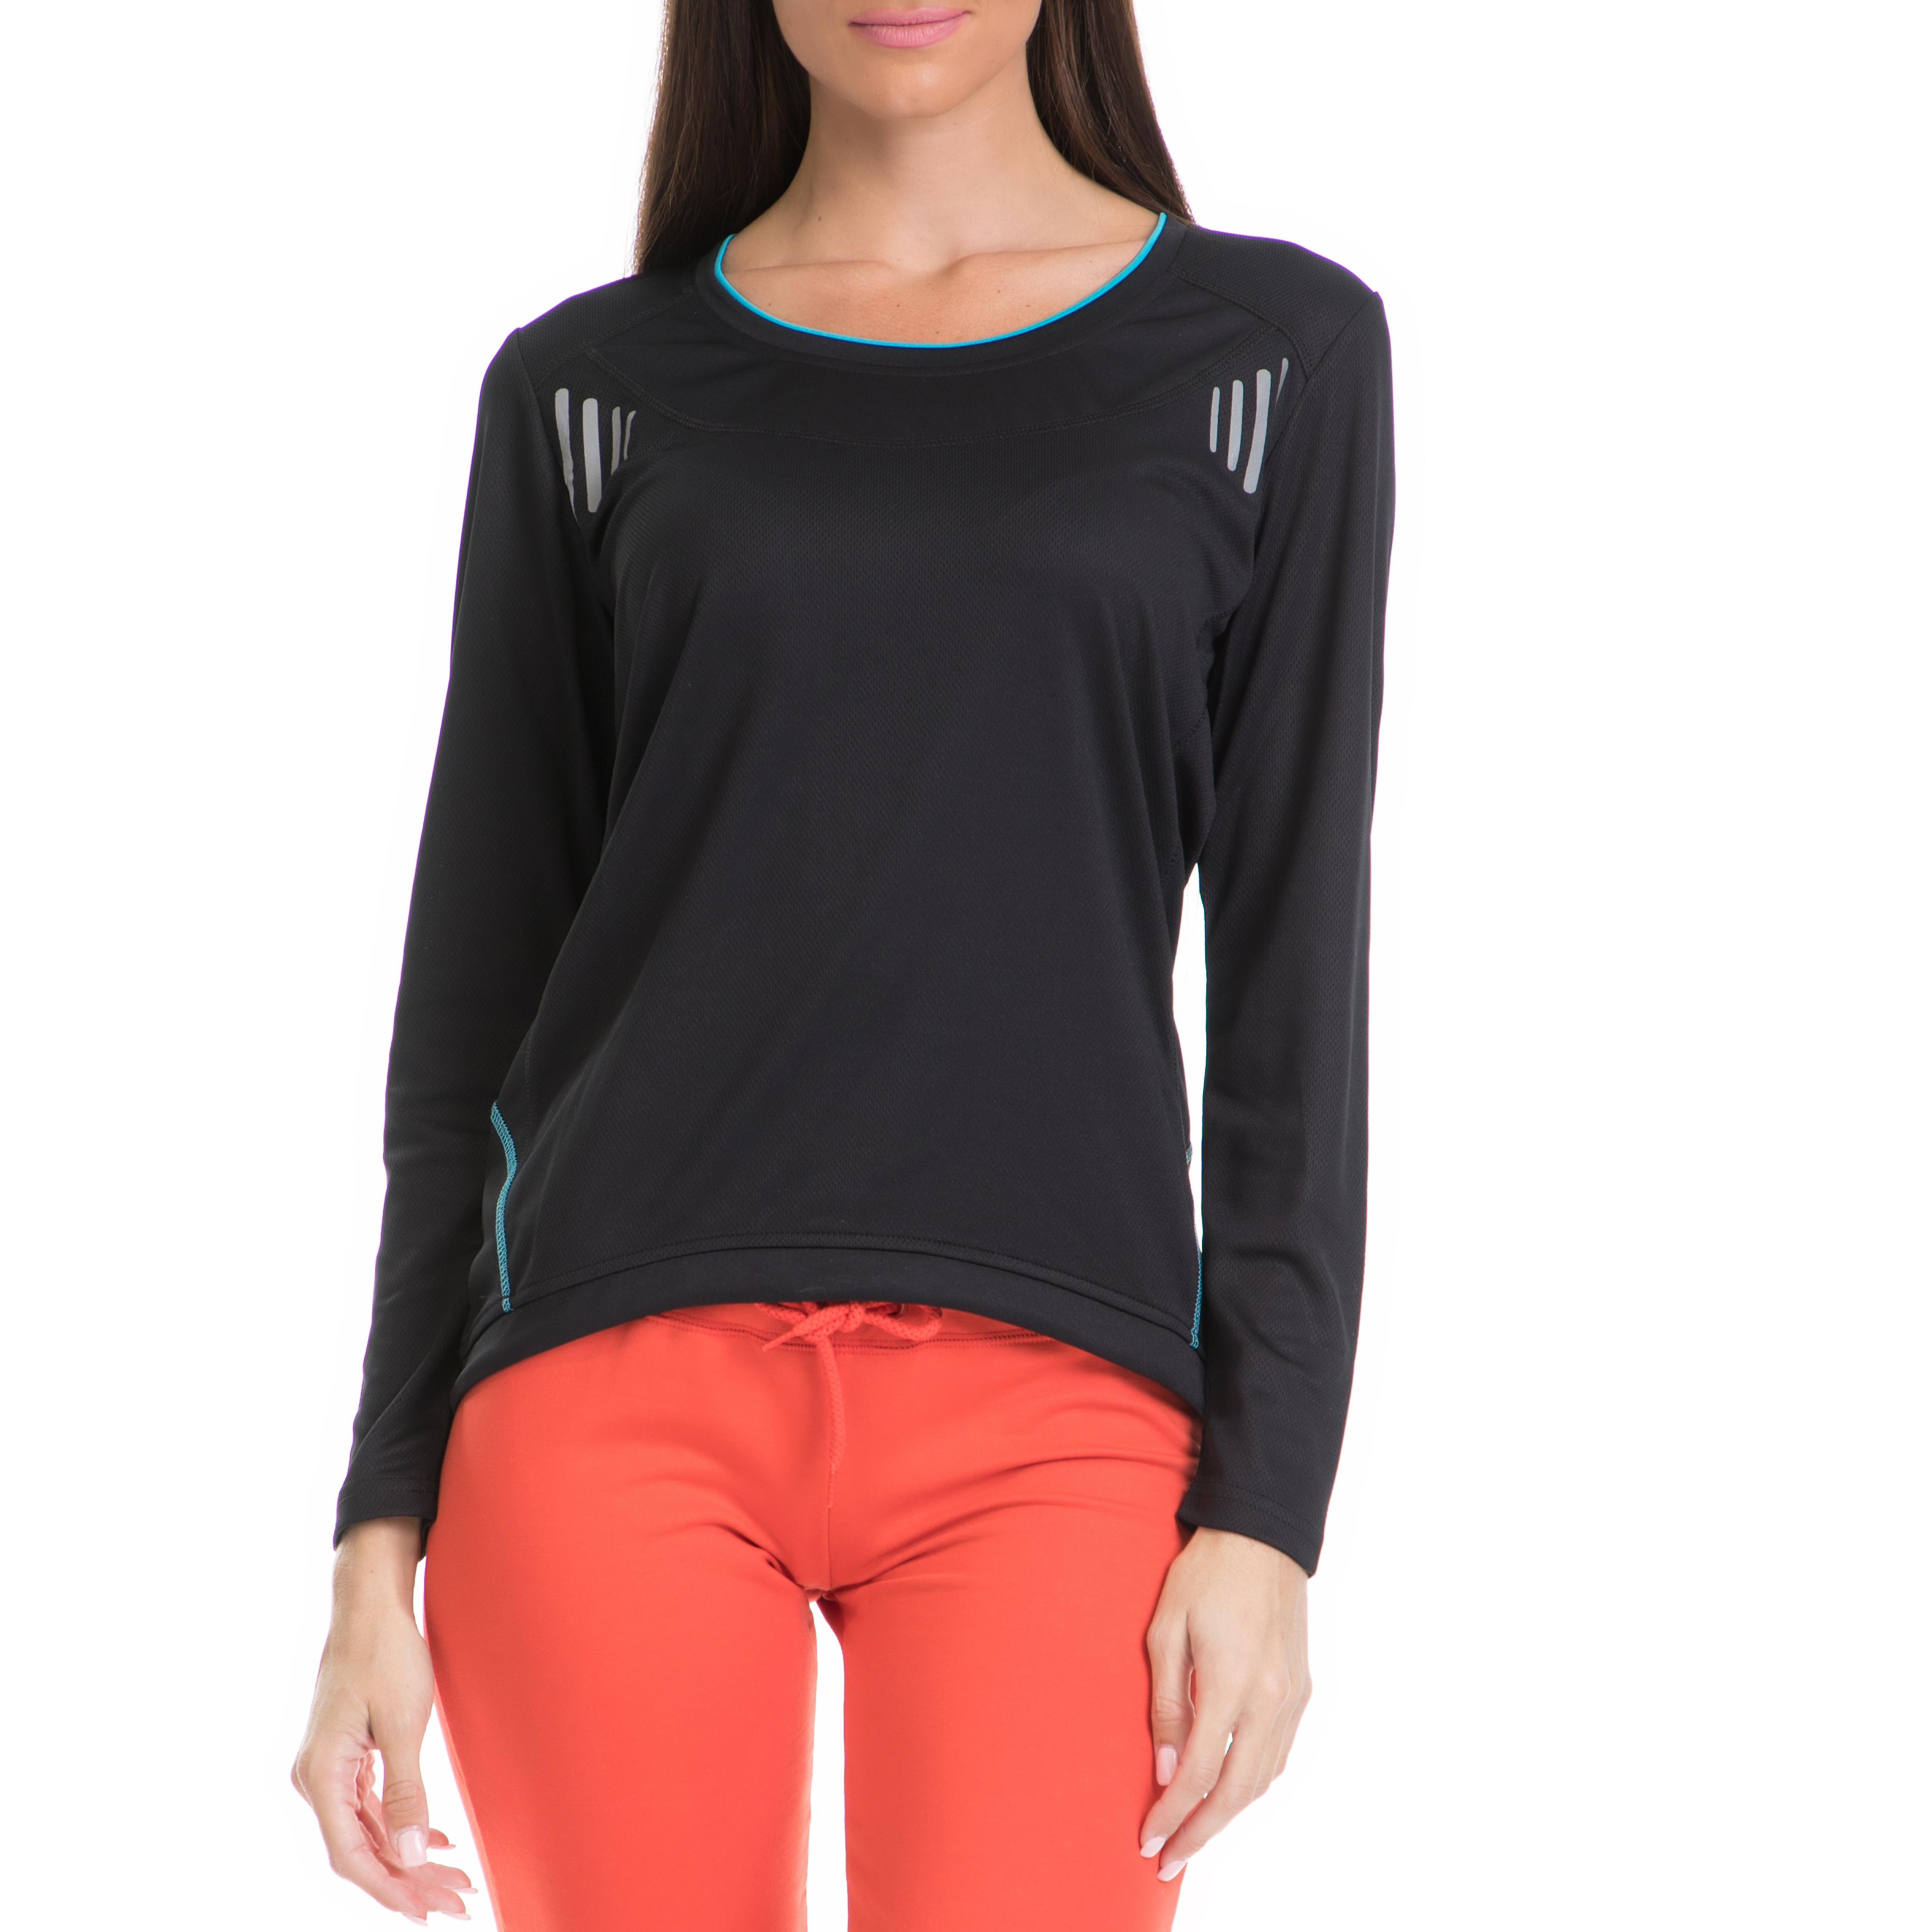 d53fdef54c11 BODYTALK - Γυναικεία μπλούζα BODYTALK μαύρη